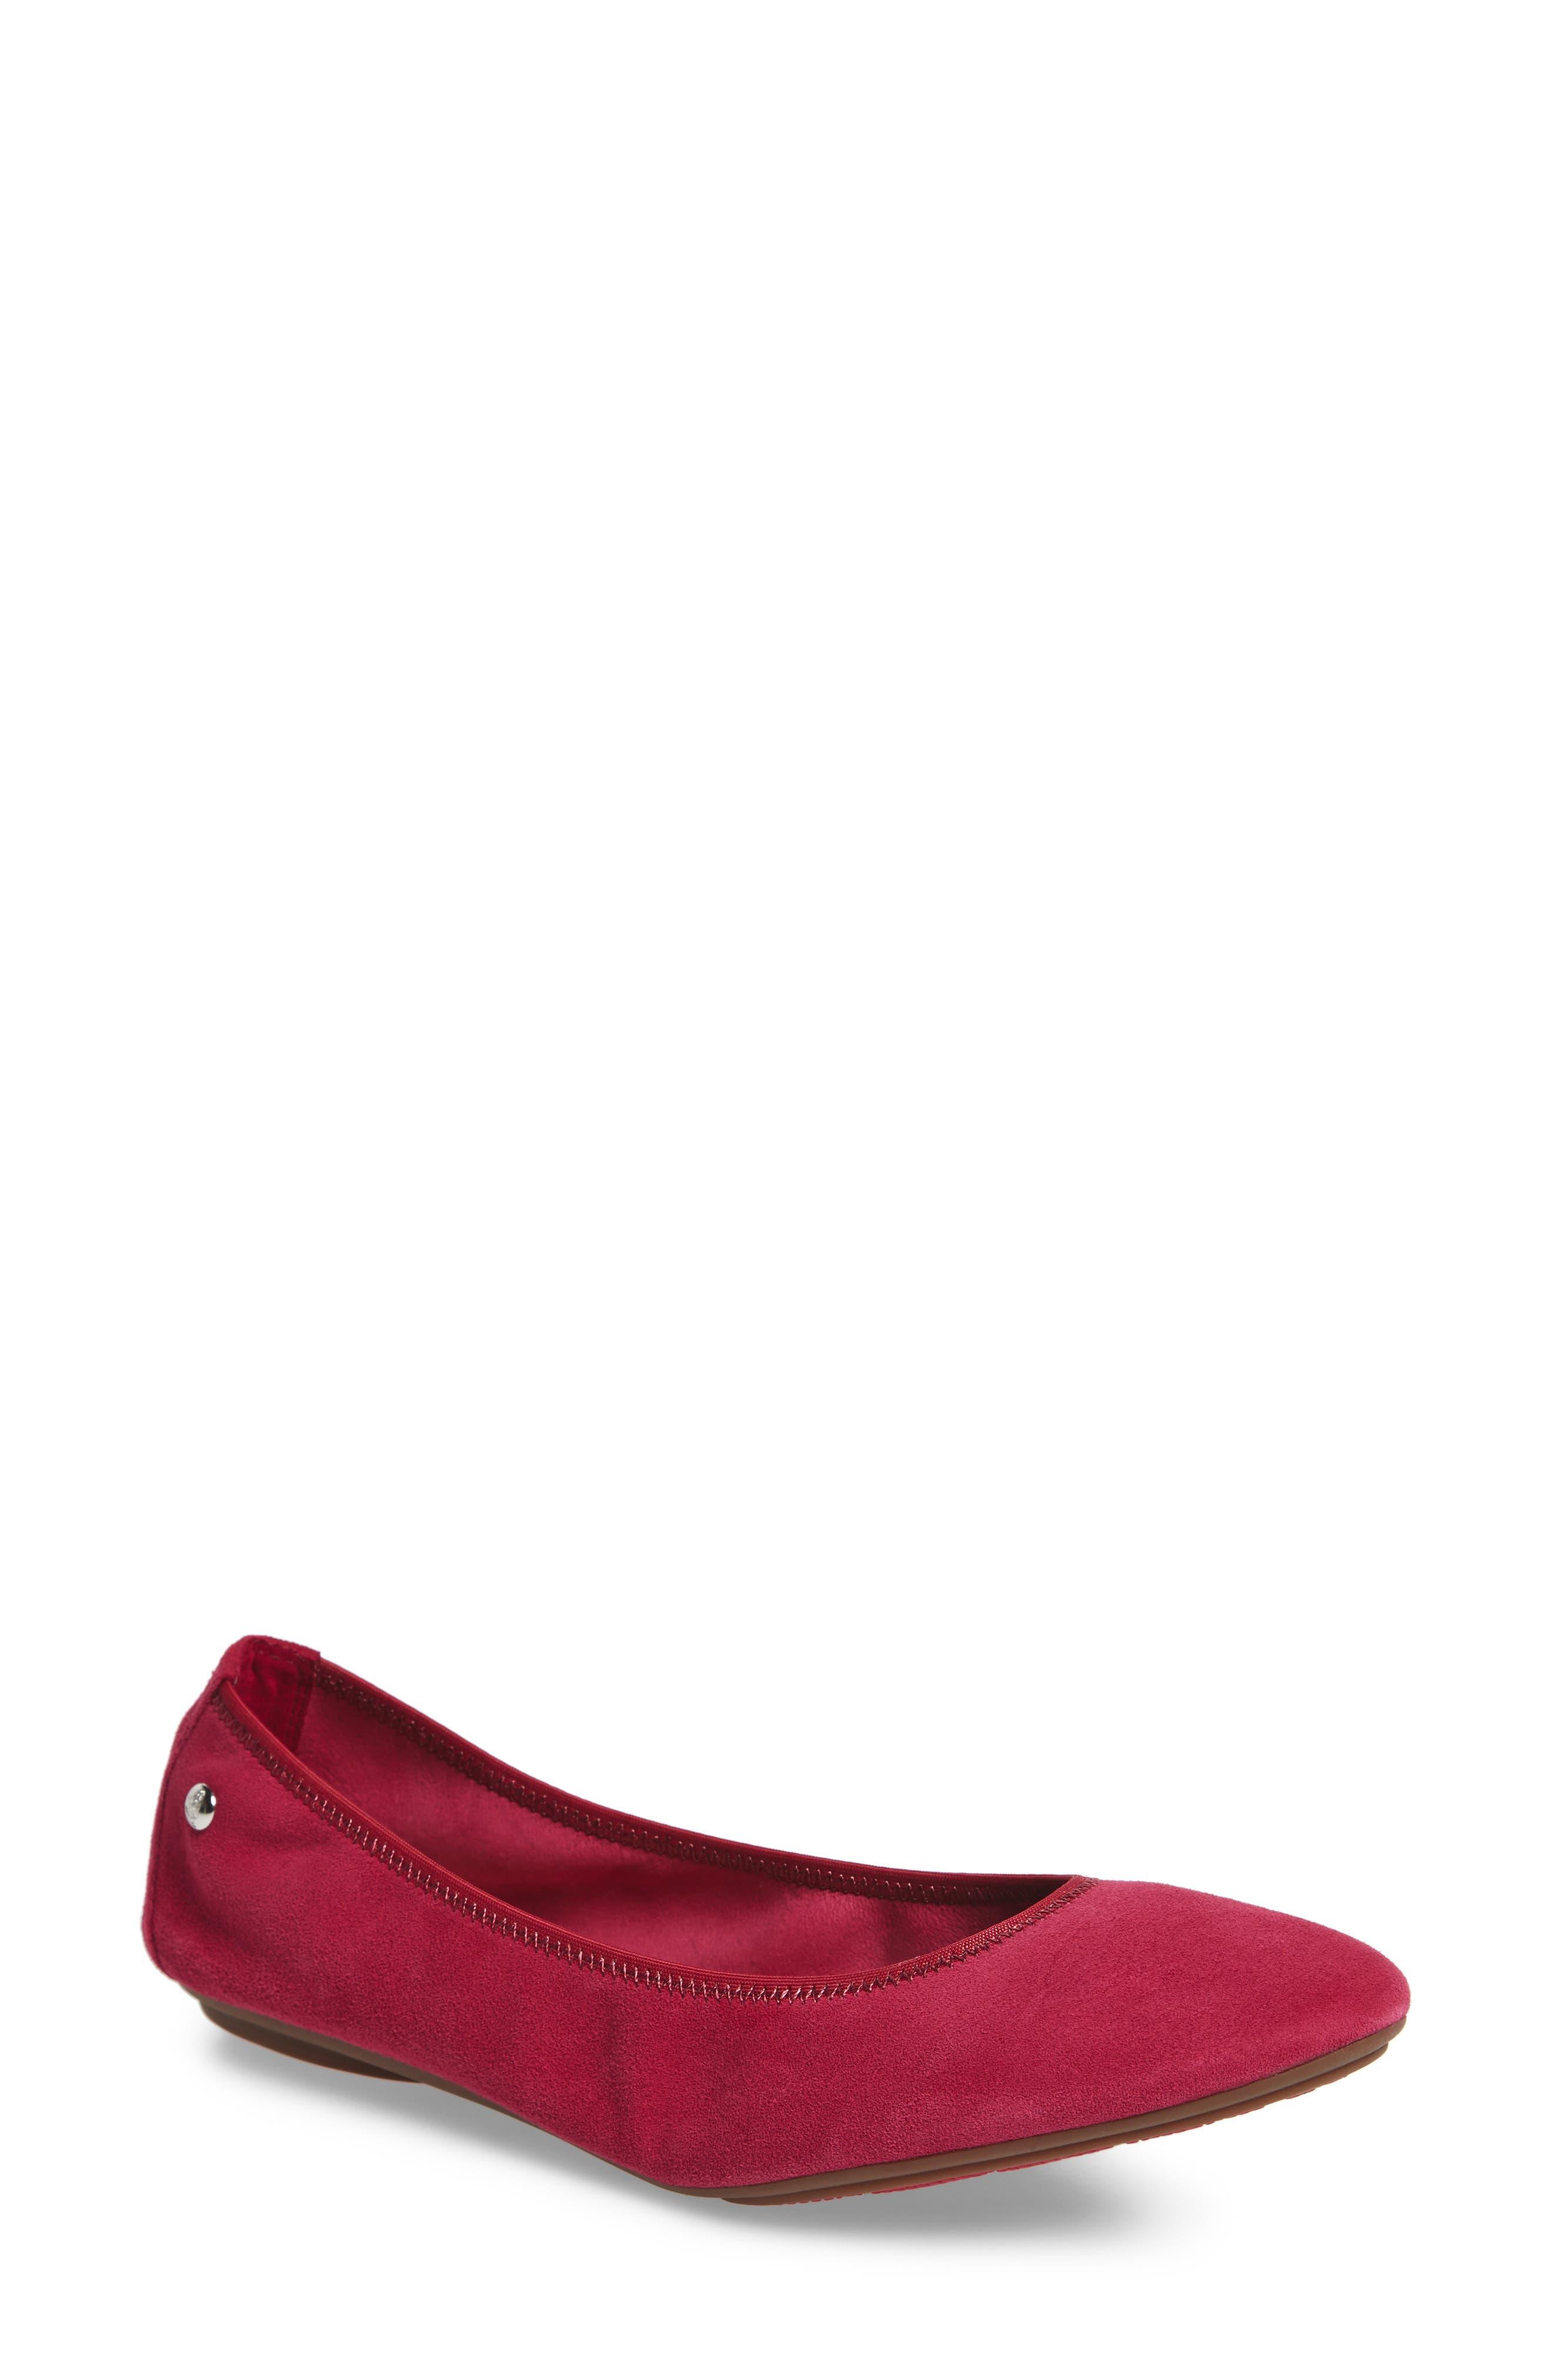 'Chaste' Ballet Flat,                         Main,                         color, Sangria Suede